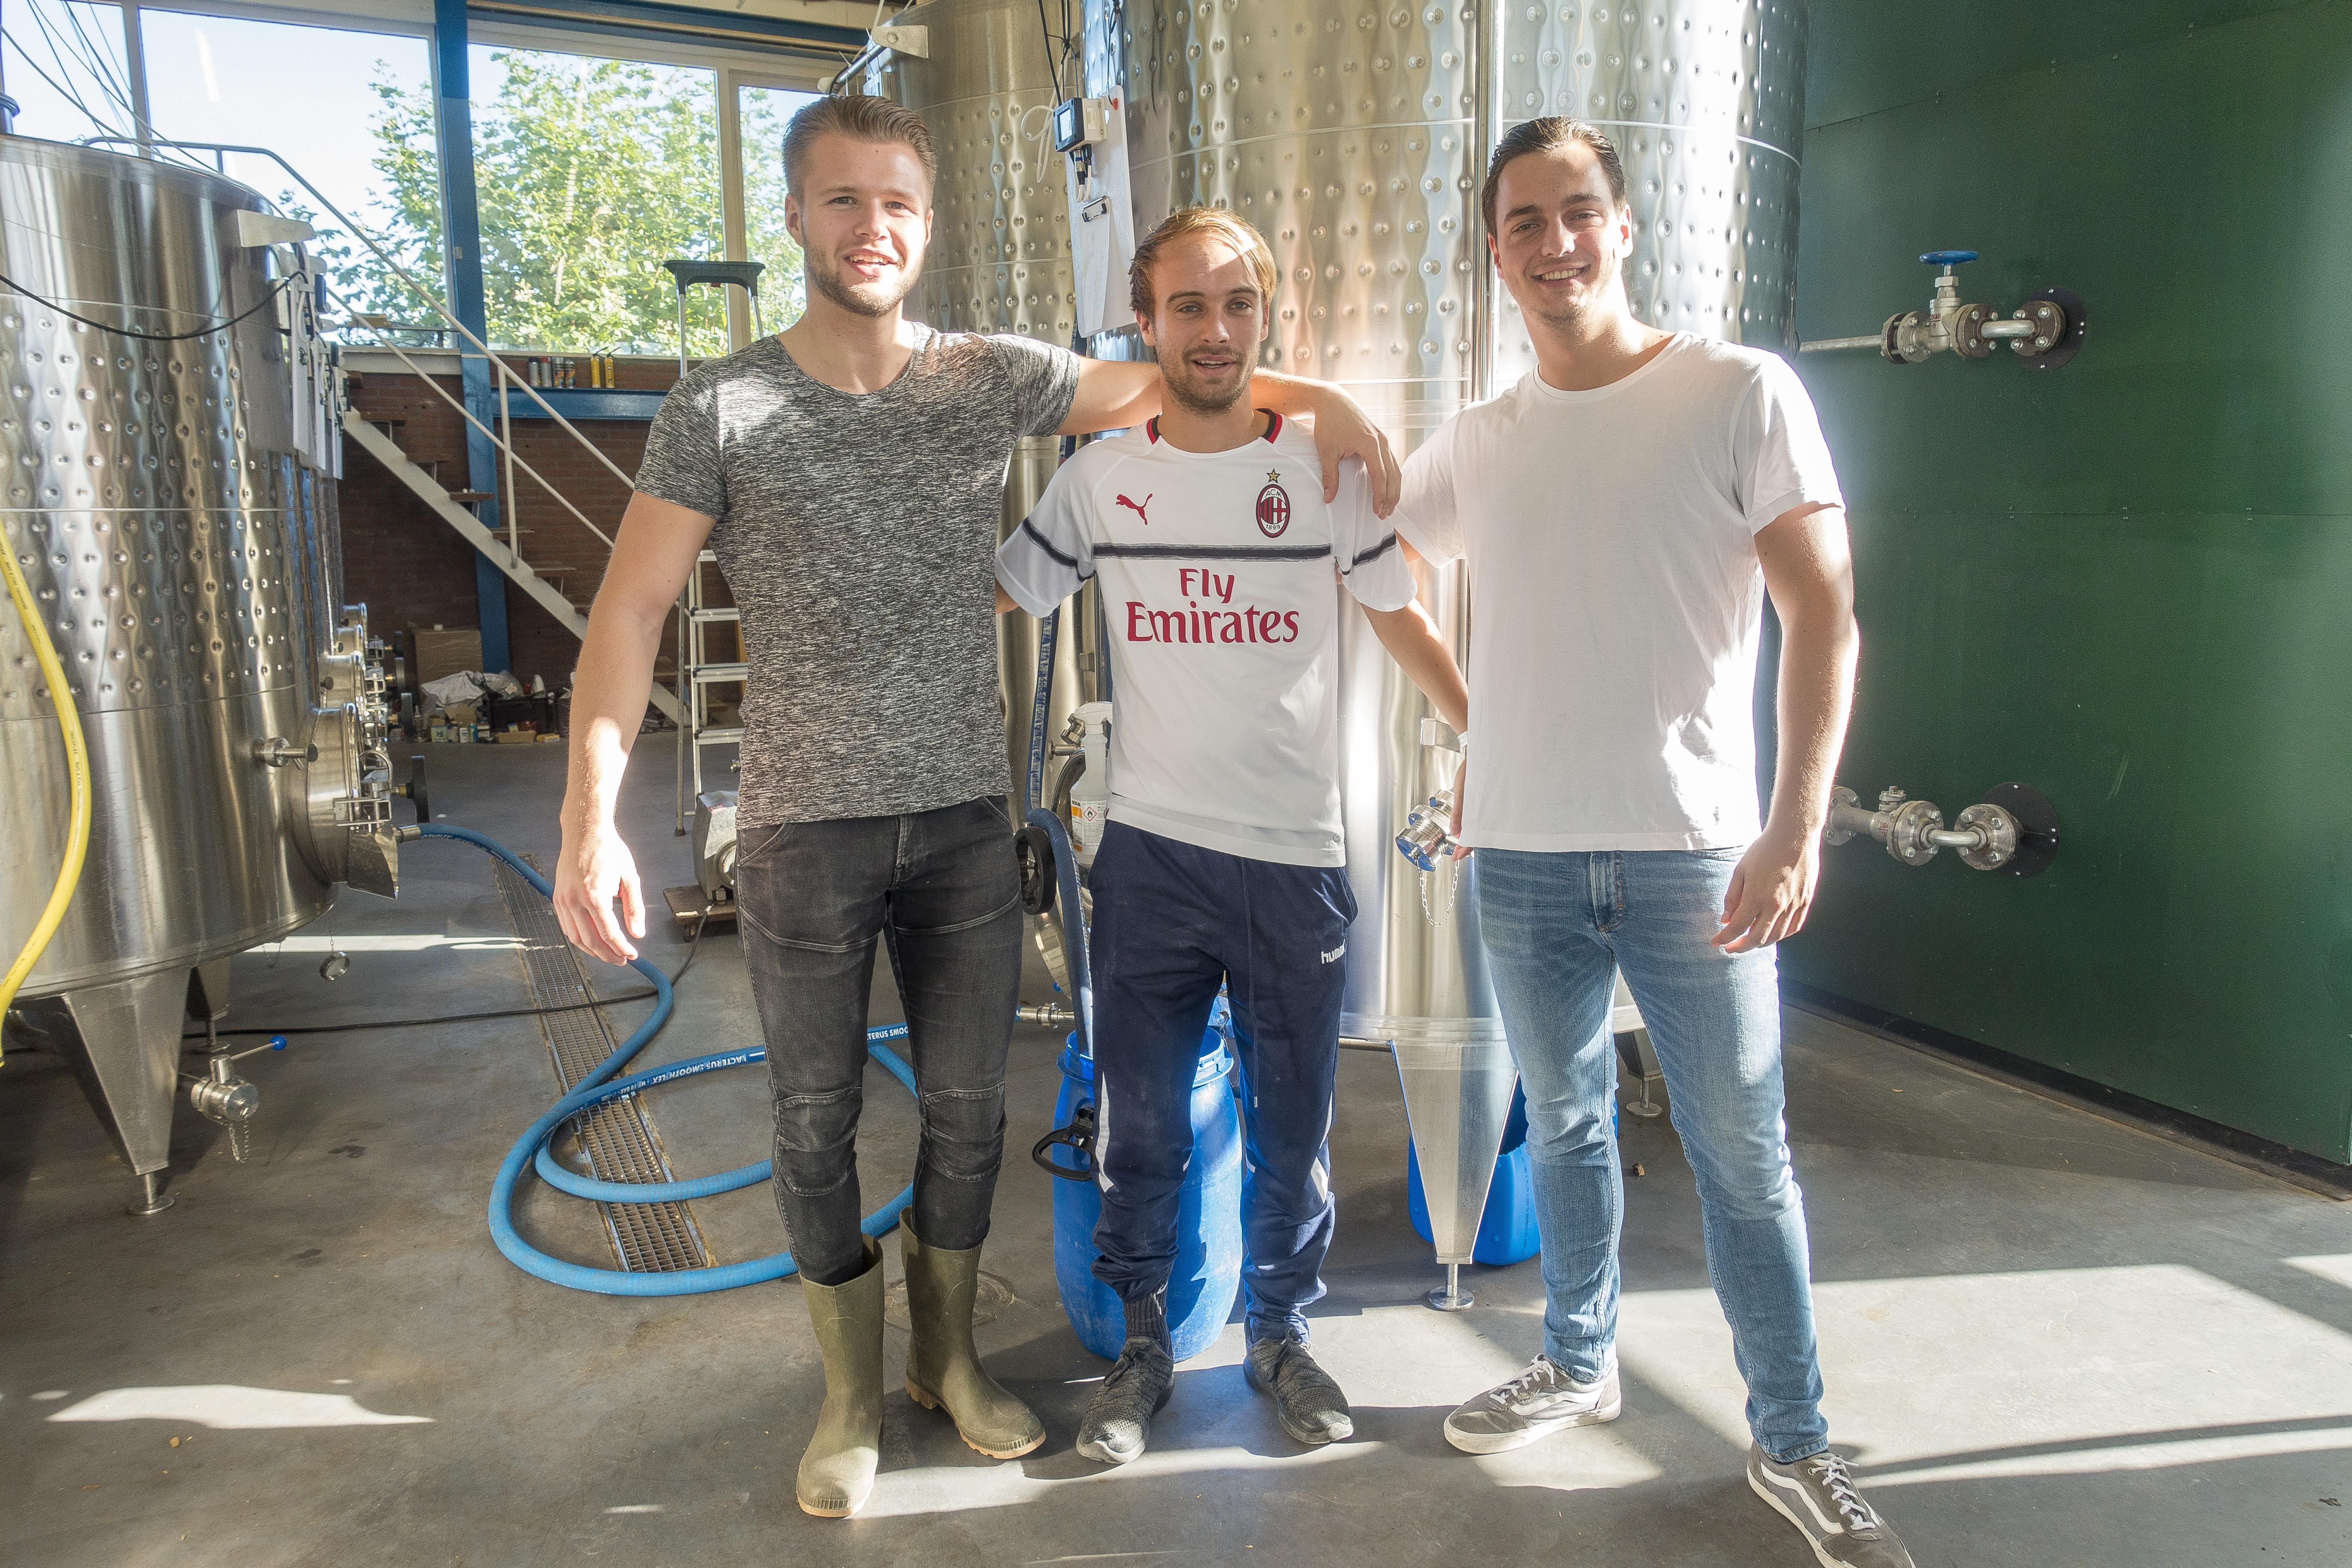 Vlnr: Lars Kerkhoff, Mike Olgers, en Pim Bronts, bij 'hun' 2000-liter tank. Laura Knip niet op foto wegens ziekte (foto: Anita Webbe